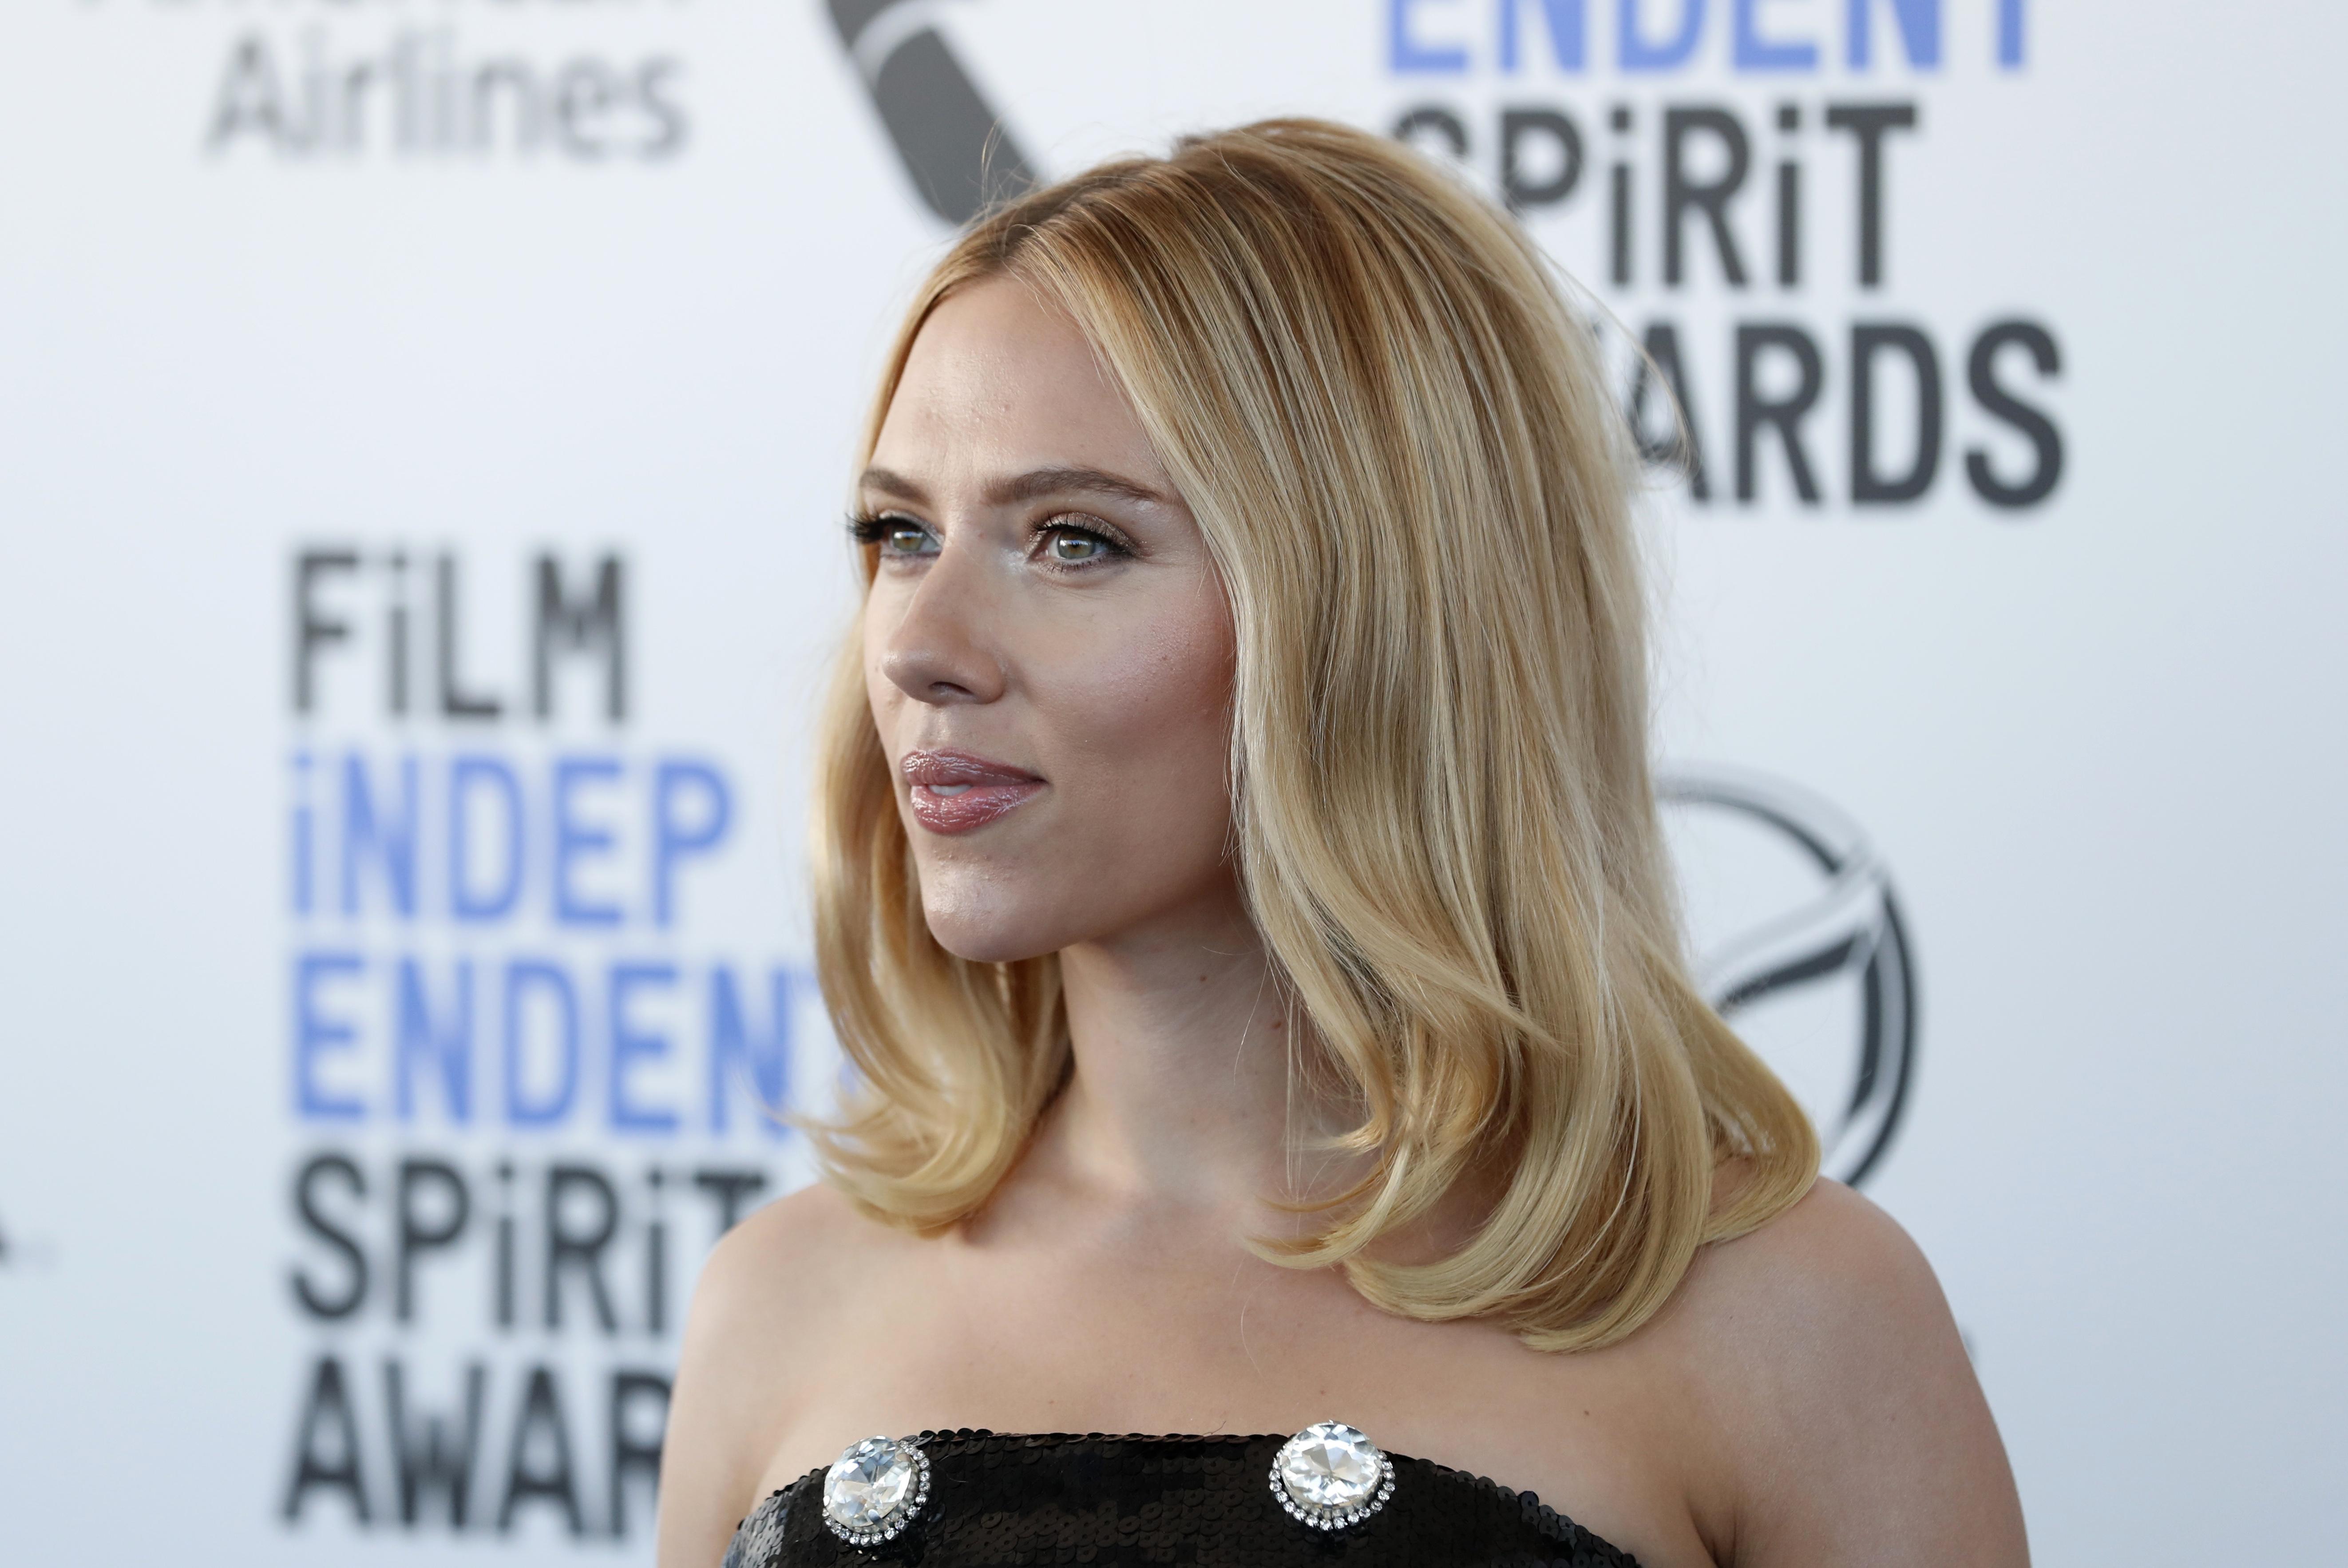 Scarlett Johansson at the 35th Film Independent Spirit Awards in Santa Monica, California, February 8, 2020. REUTERS/Lucas Jackson